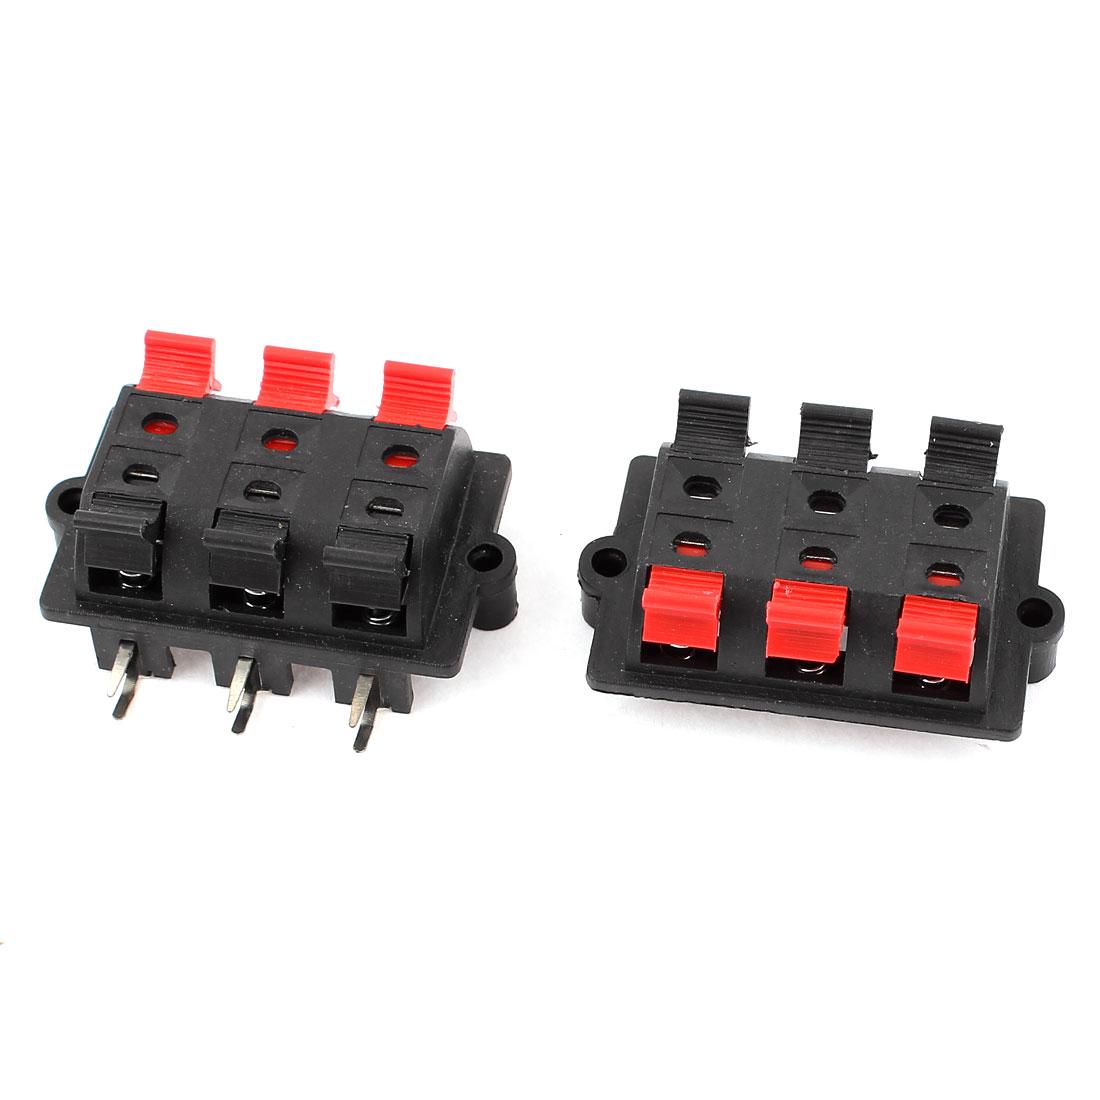 2pcs 6 Way Spring Push Release Connector Plate Speaker Terminal Strip Block(China (Mainland))